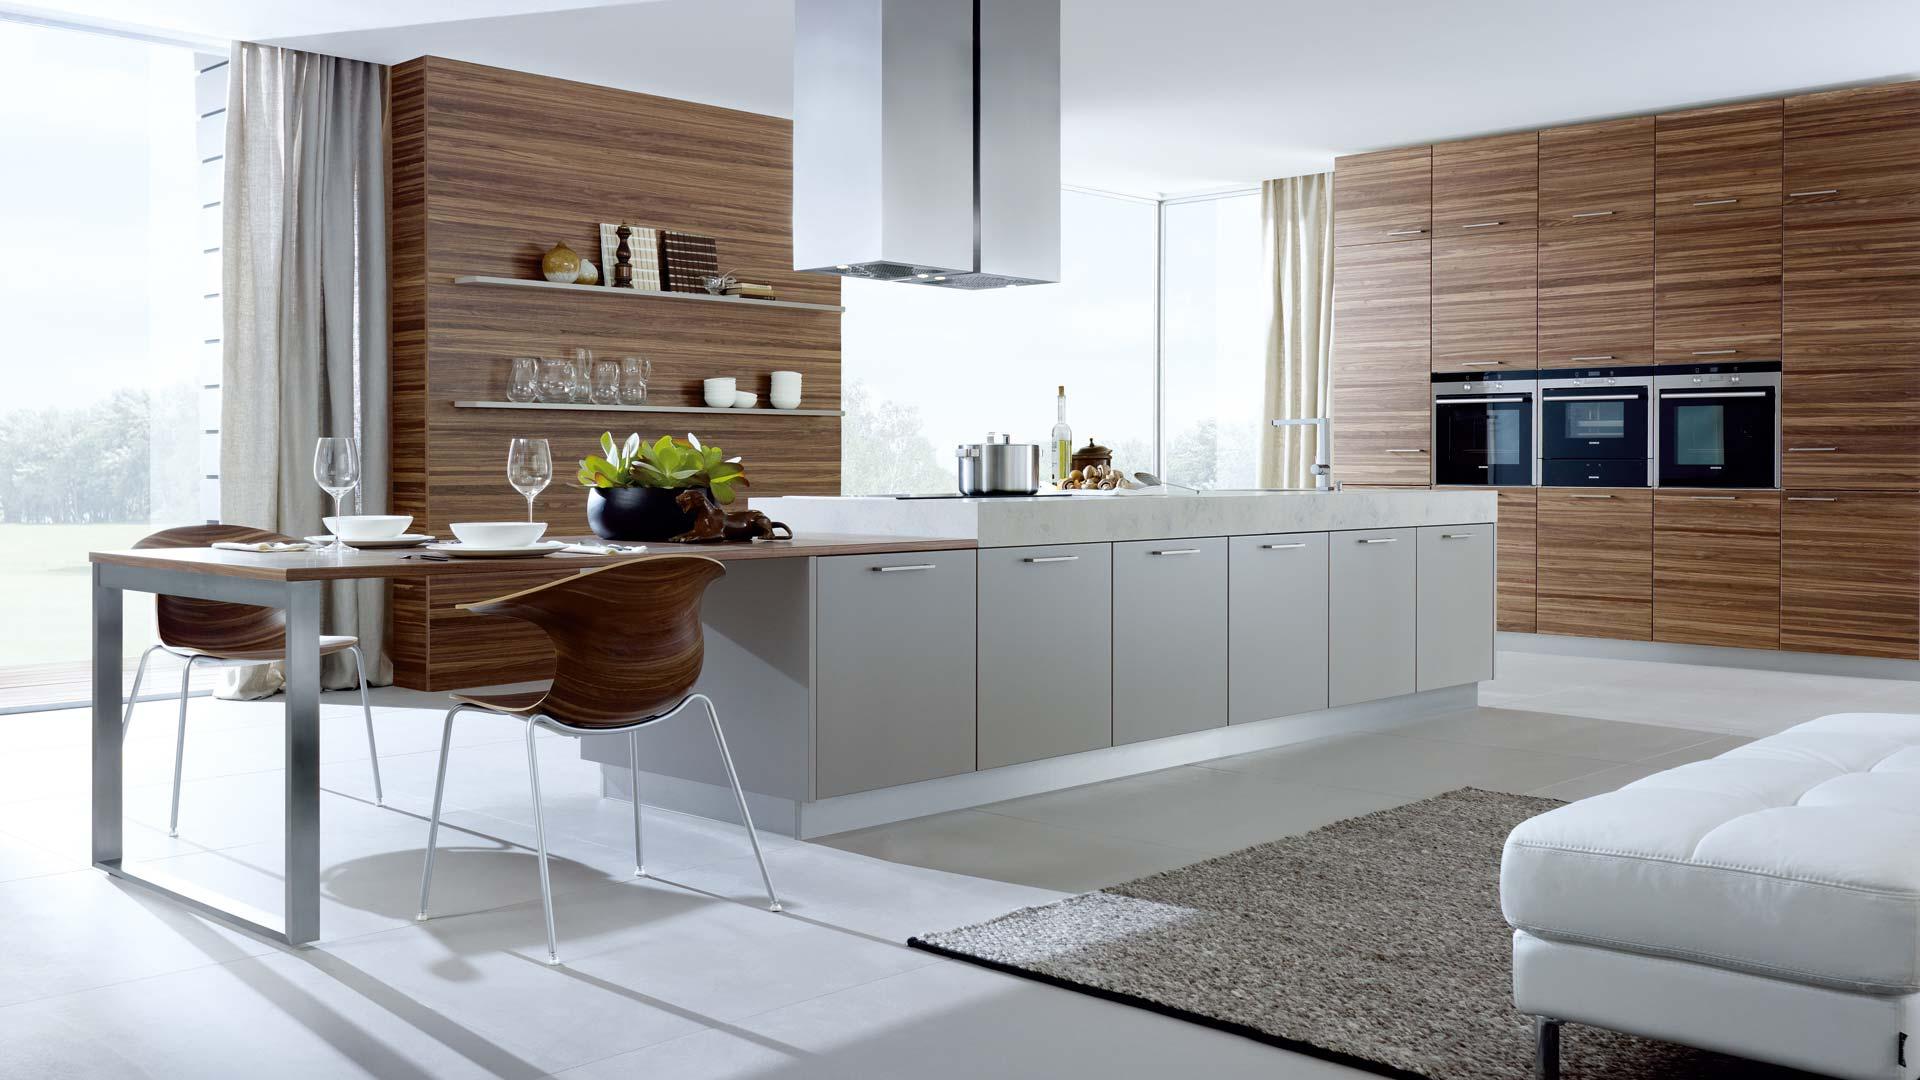 kchenstudio limburg dresden u privatrume with kchenstudio limburg good team thalia mbel u. Black Bedroom Furniture Sets. Home Design Ideas